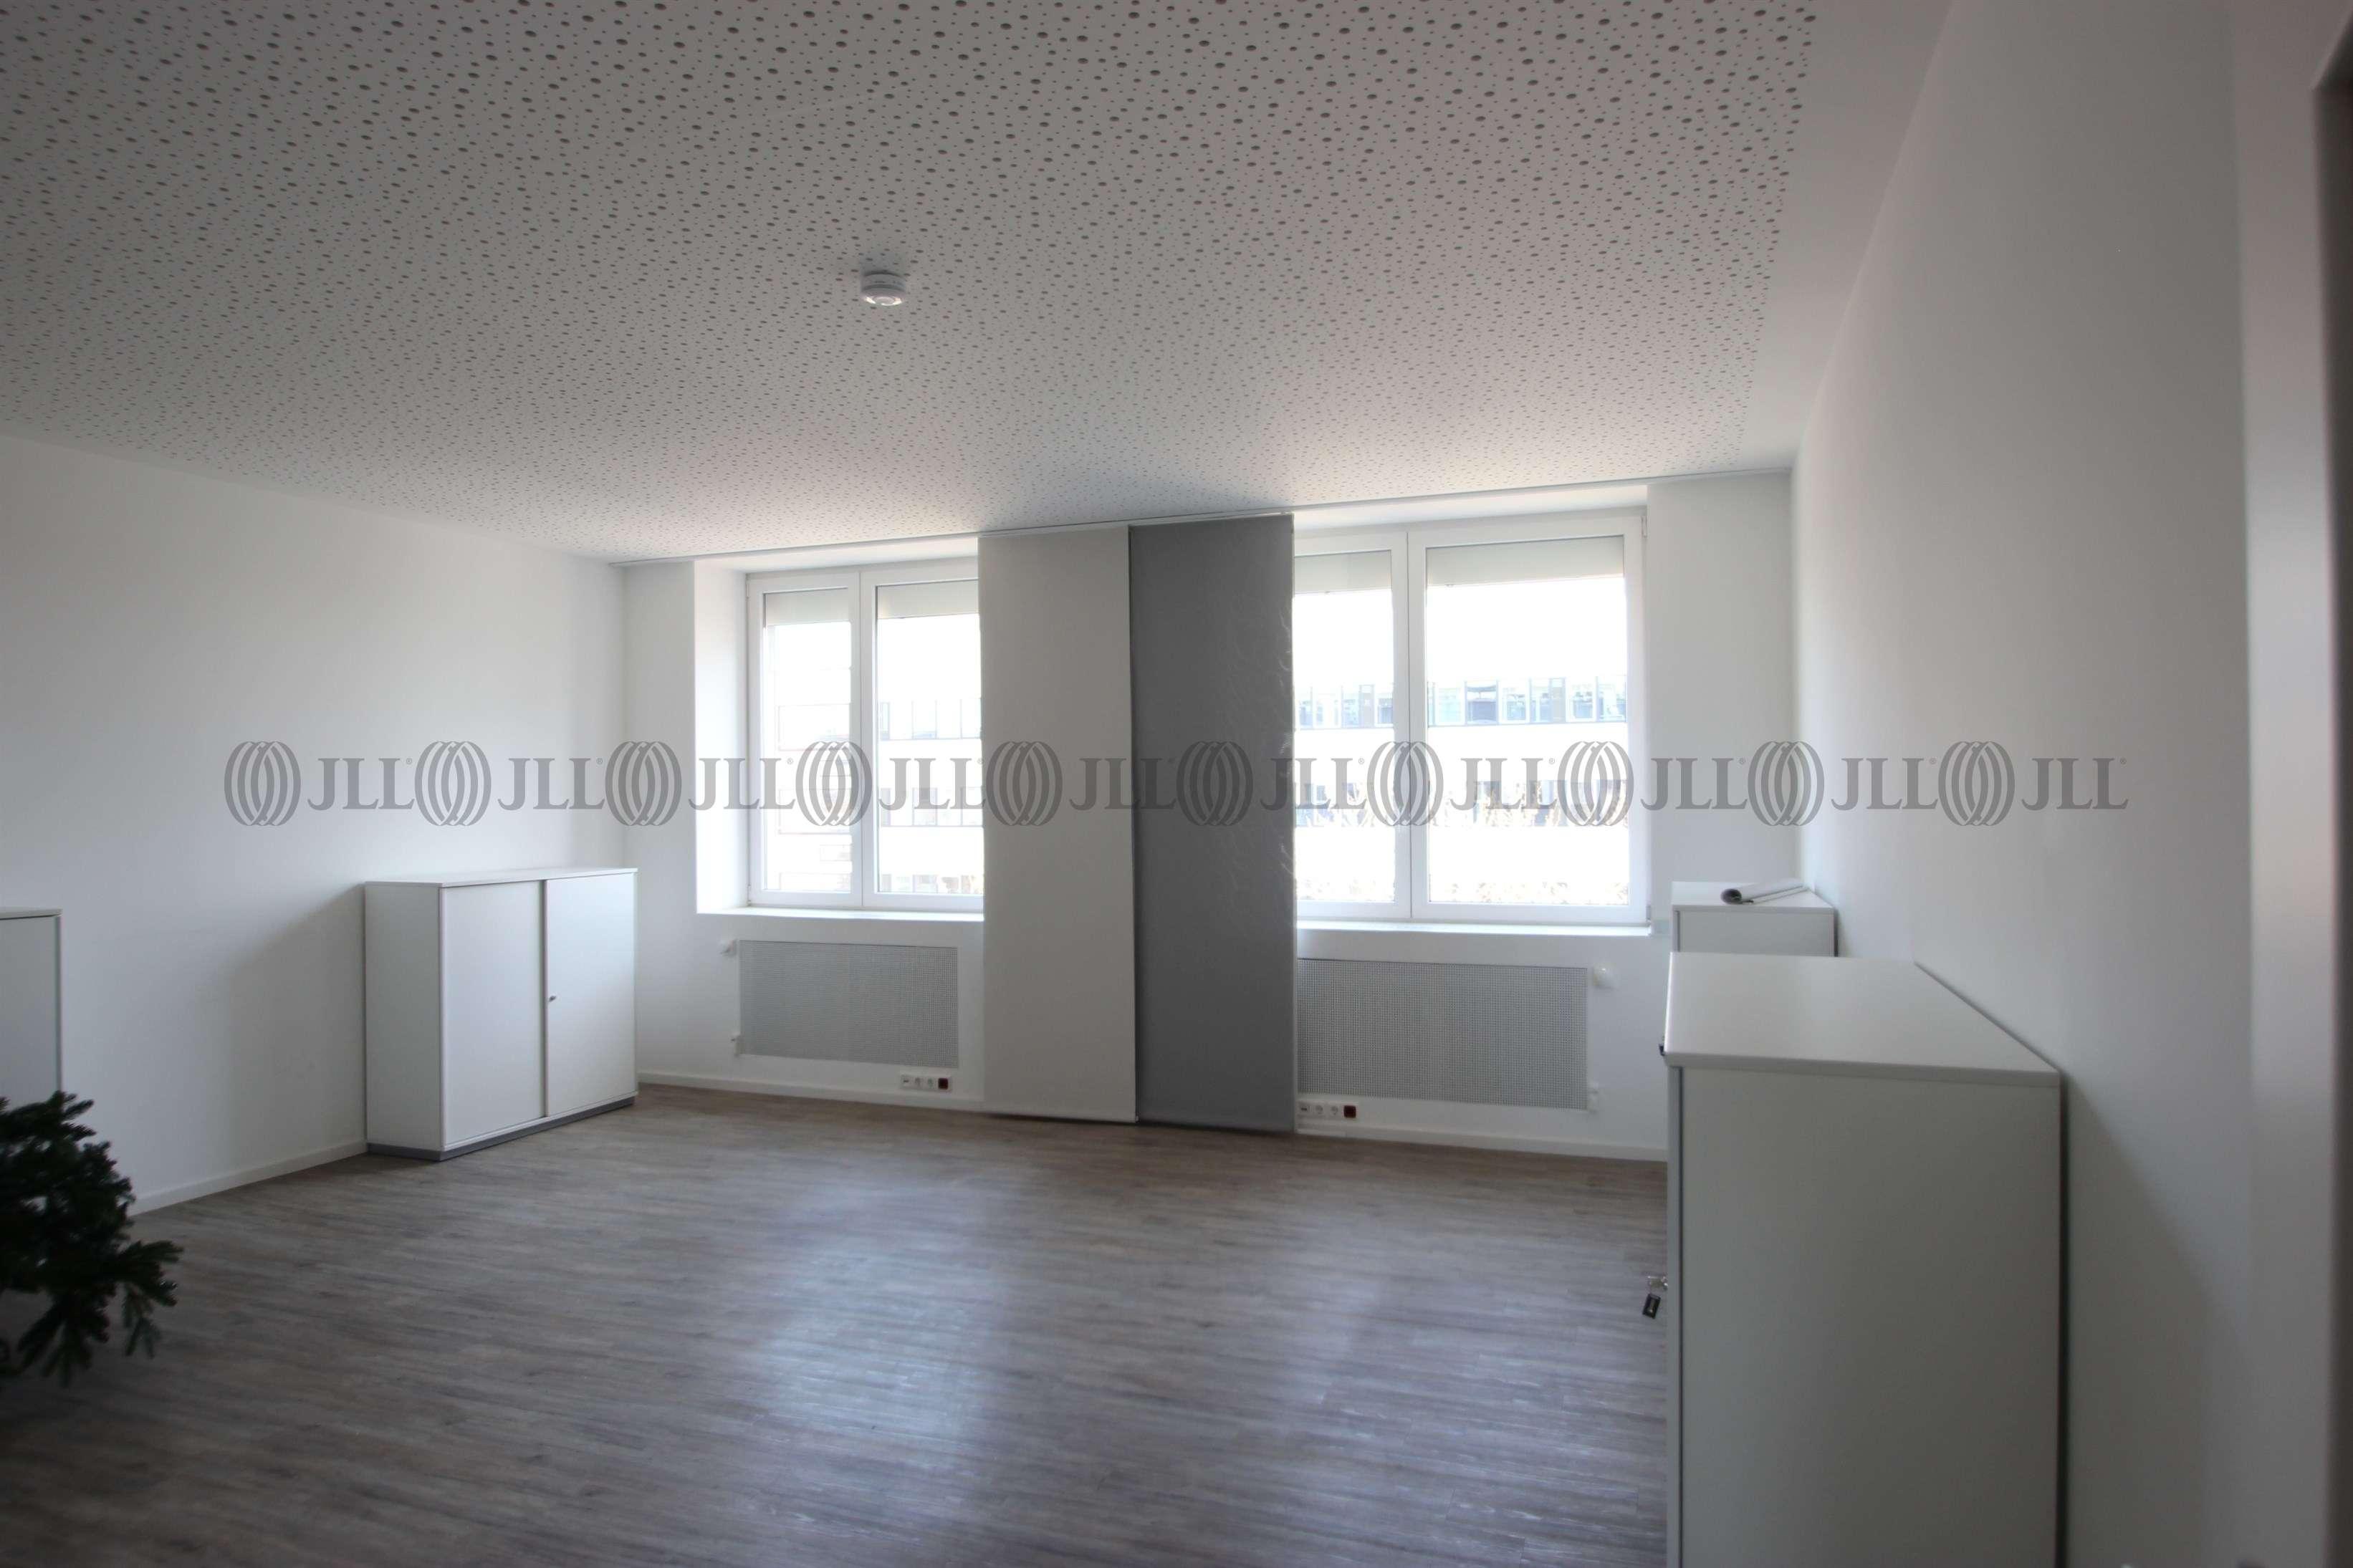 Büros Frankfurt am main, 60314 - Büro - Frankfurt am Main, Ostend - F1661 - 10046101